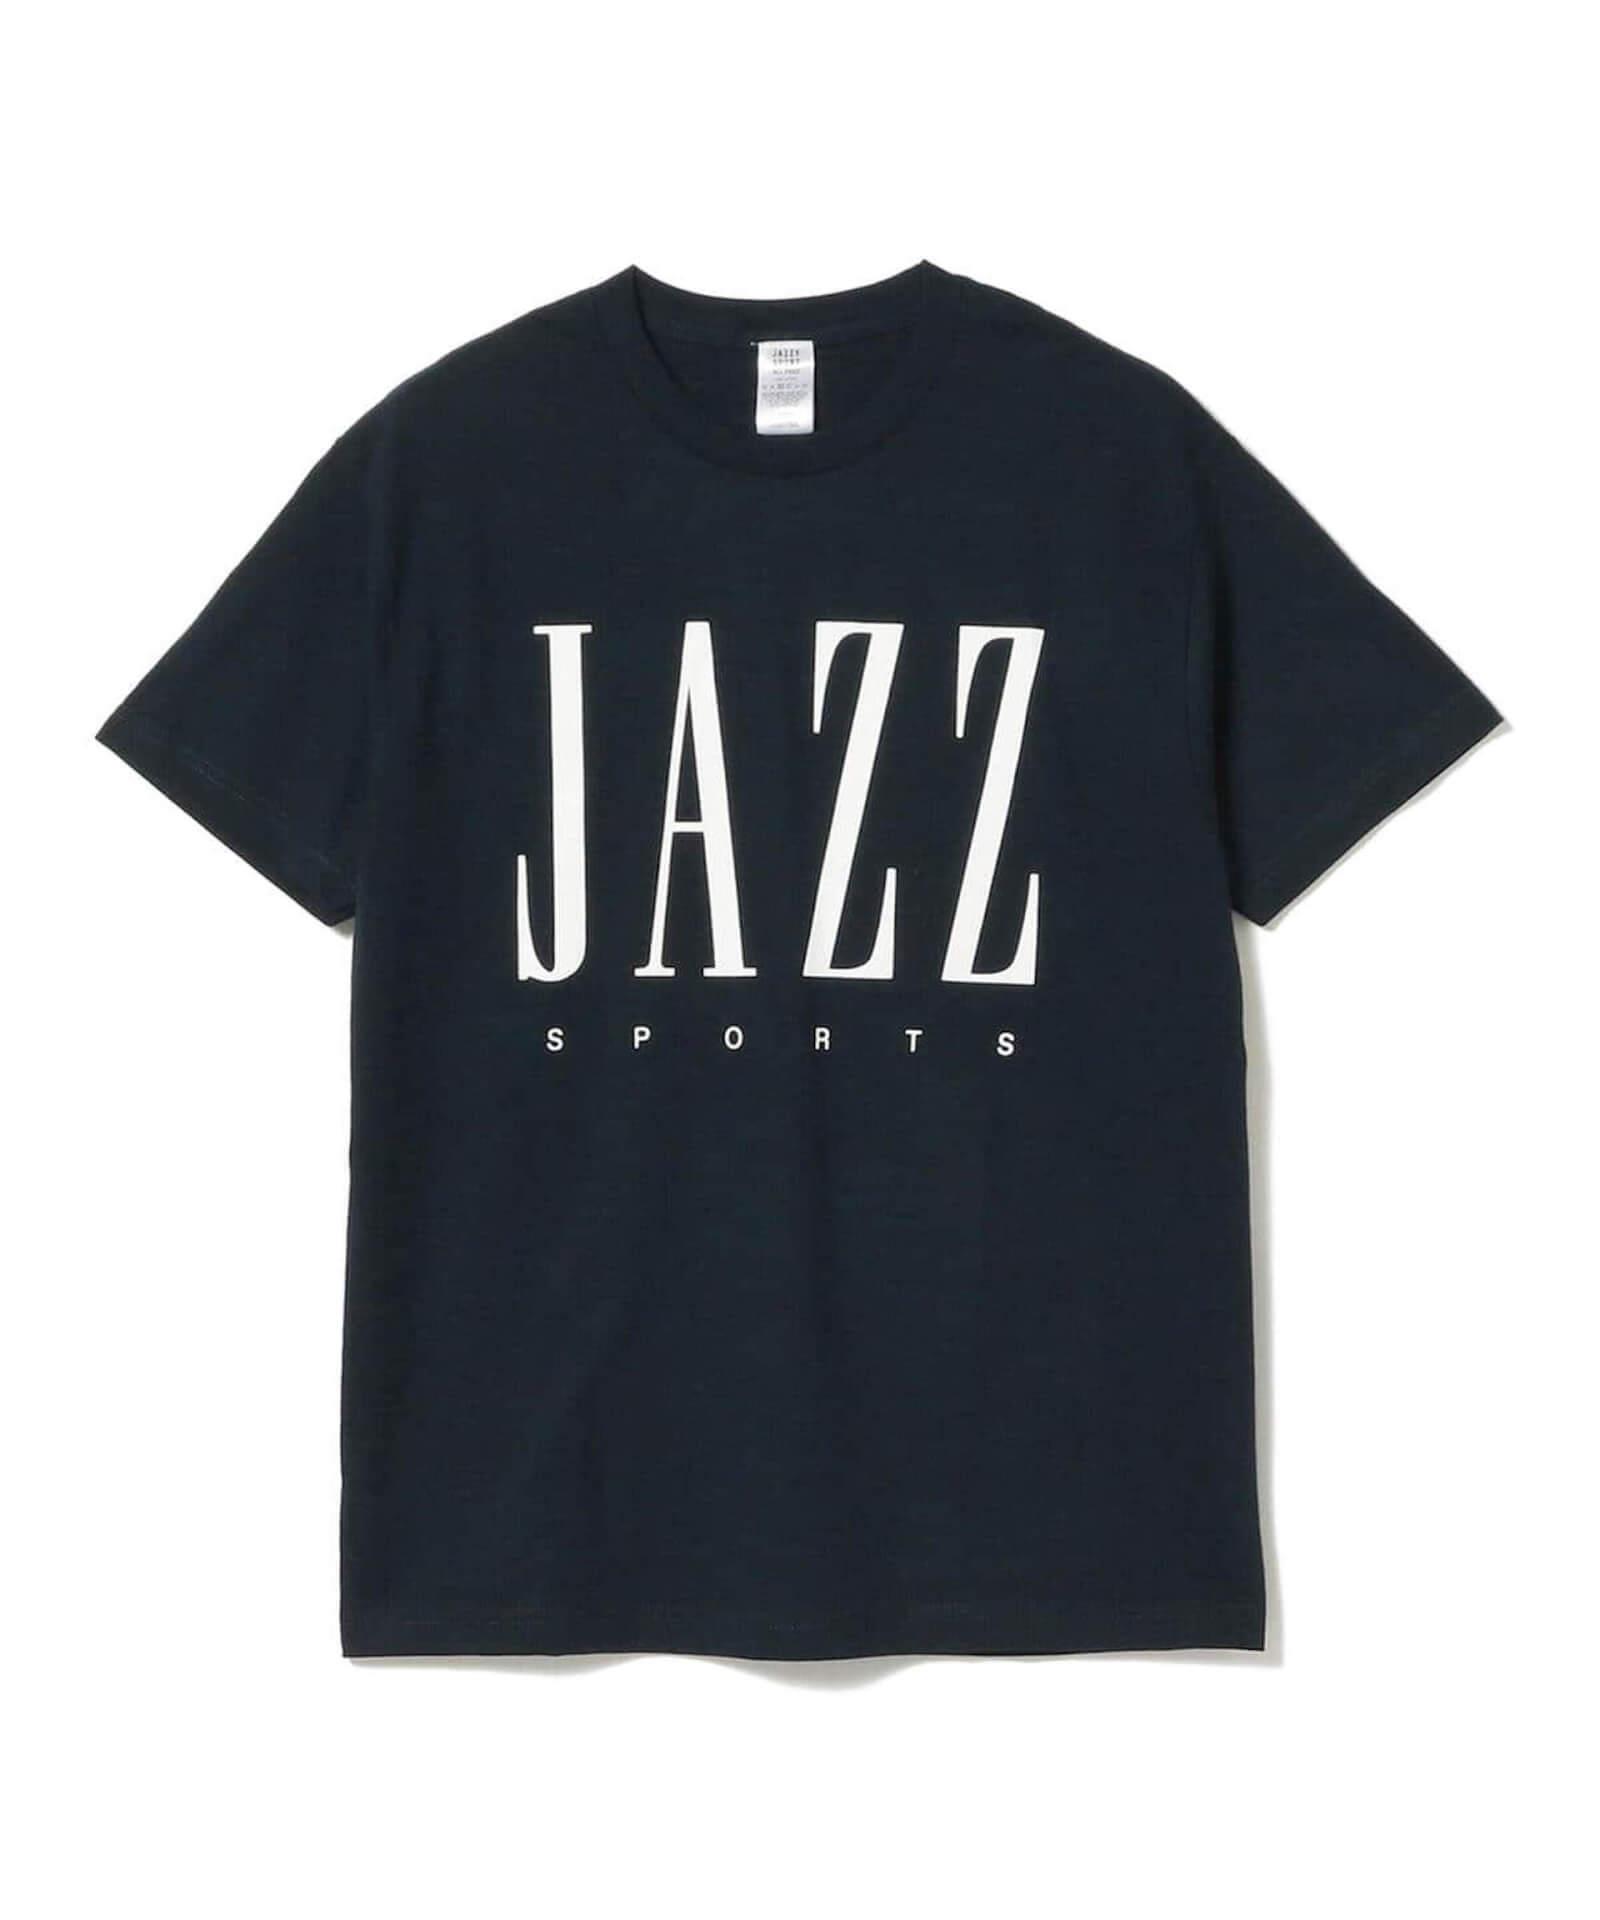 Jazzy Sport×SOUND SHOP balansaコラボTシャツがリリース決定!Beams限定販売&韓国限定のデザインも 11086037600_C_1